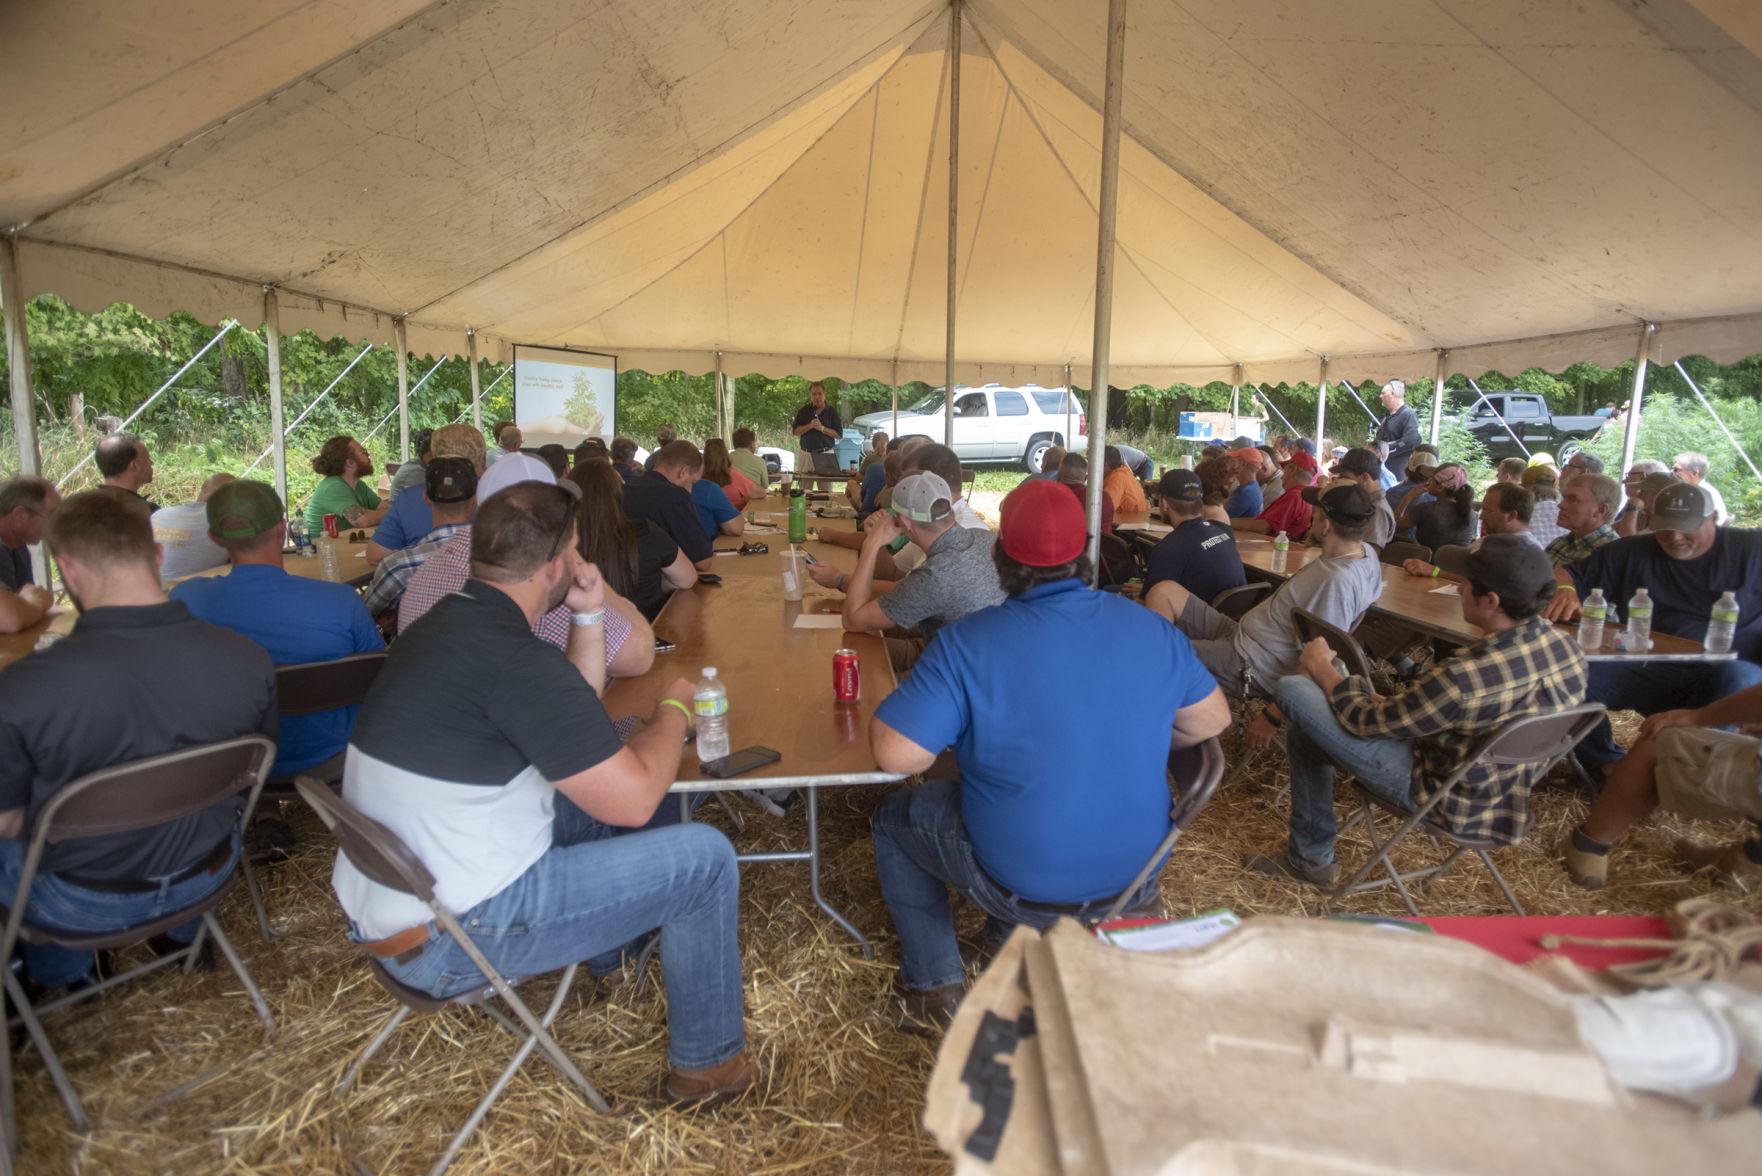 First Hemp Farmer In Cass County Co Hosts Symposium On Crop Local News Pharostribune Com